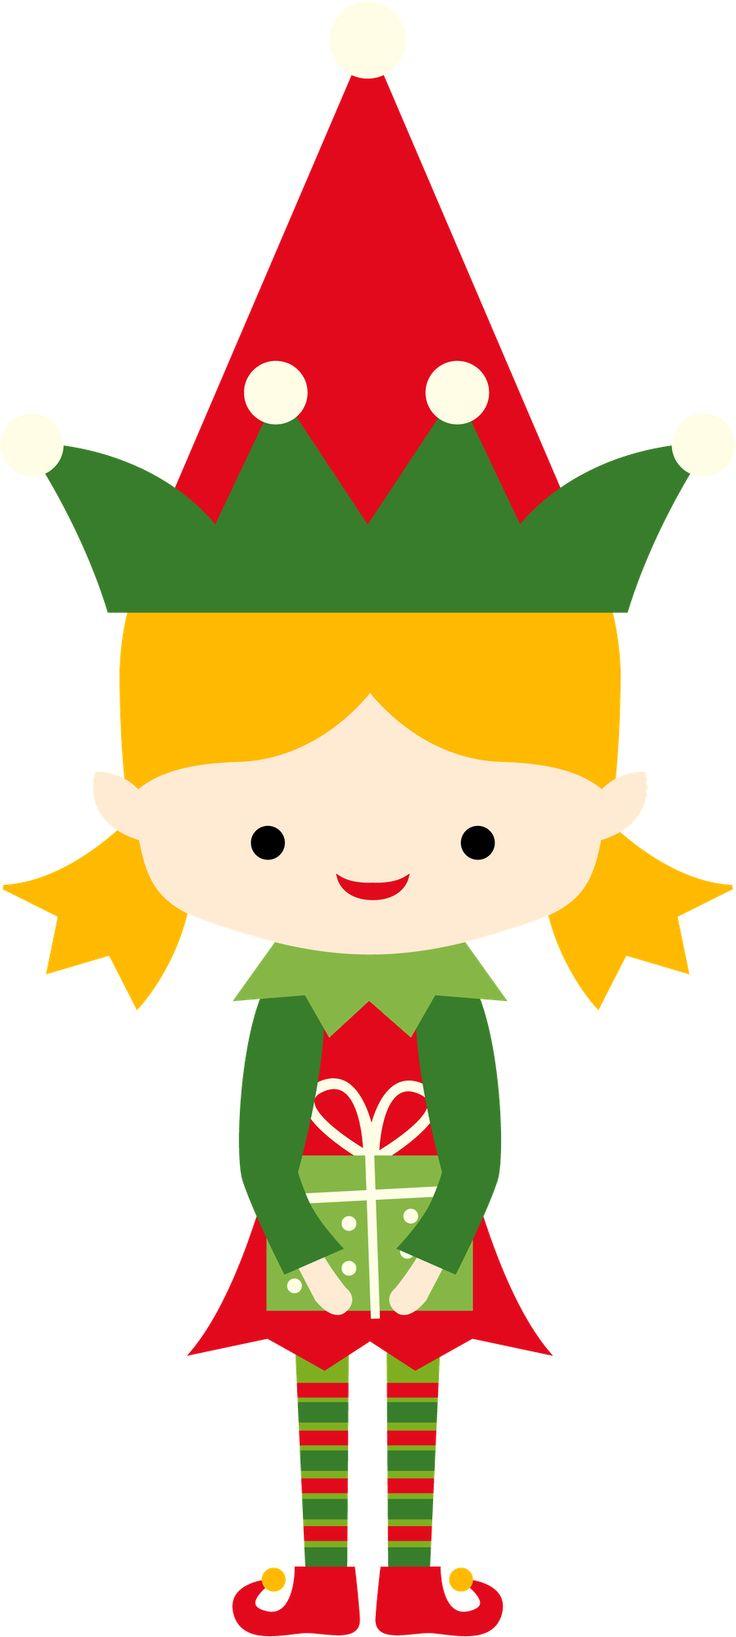 736x1637 Female Elf Elf Clip Art Merry Christmas Amp Happy New Year Arts